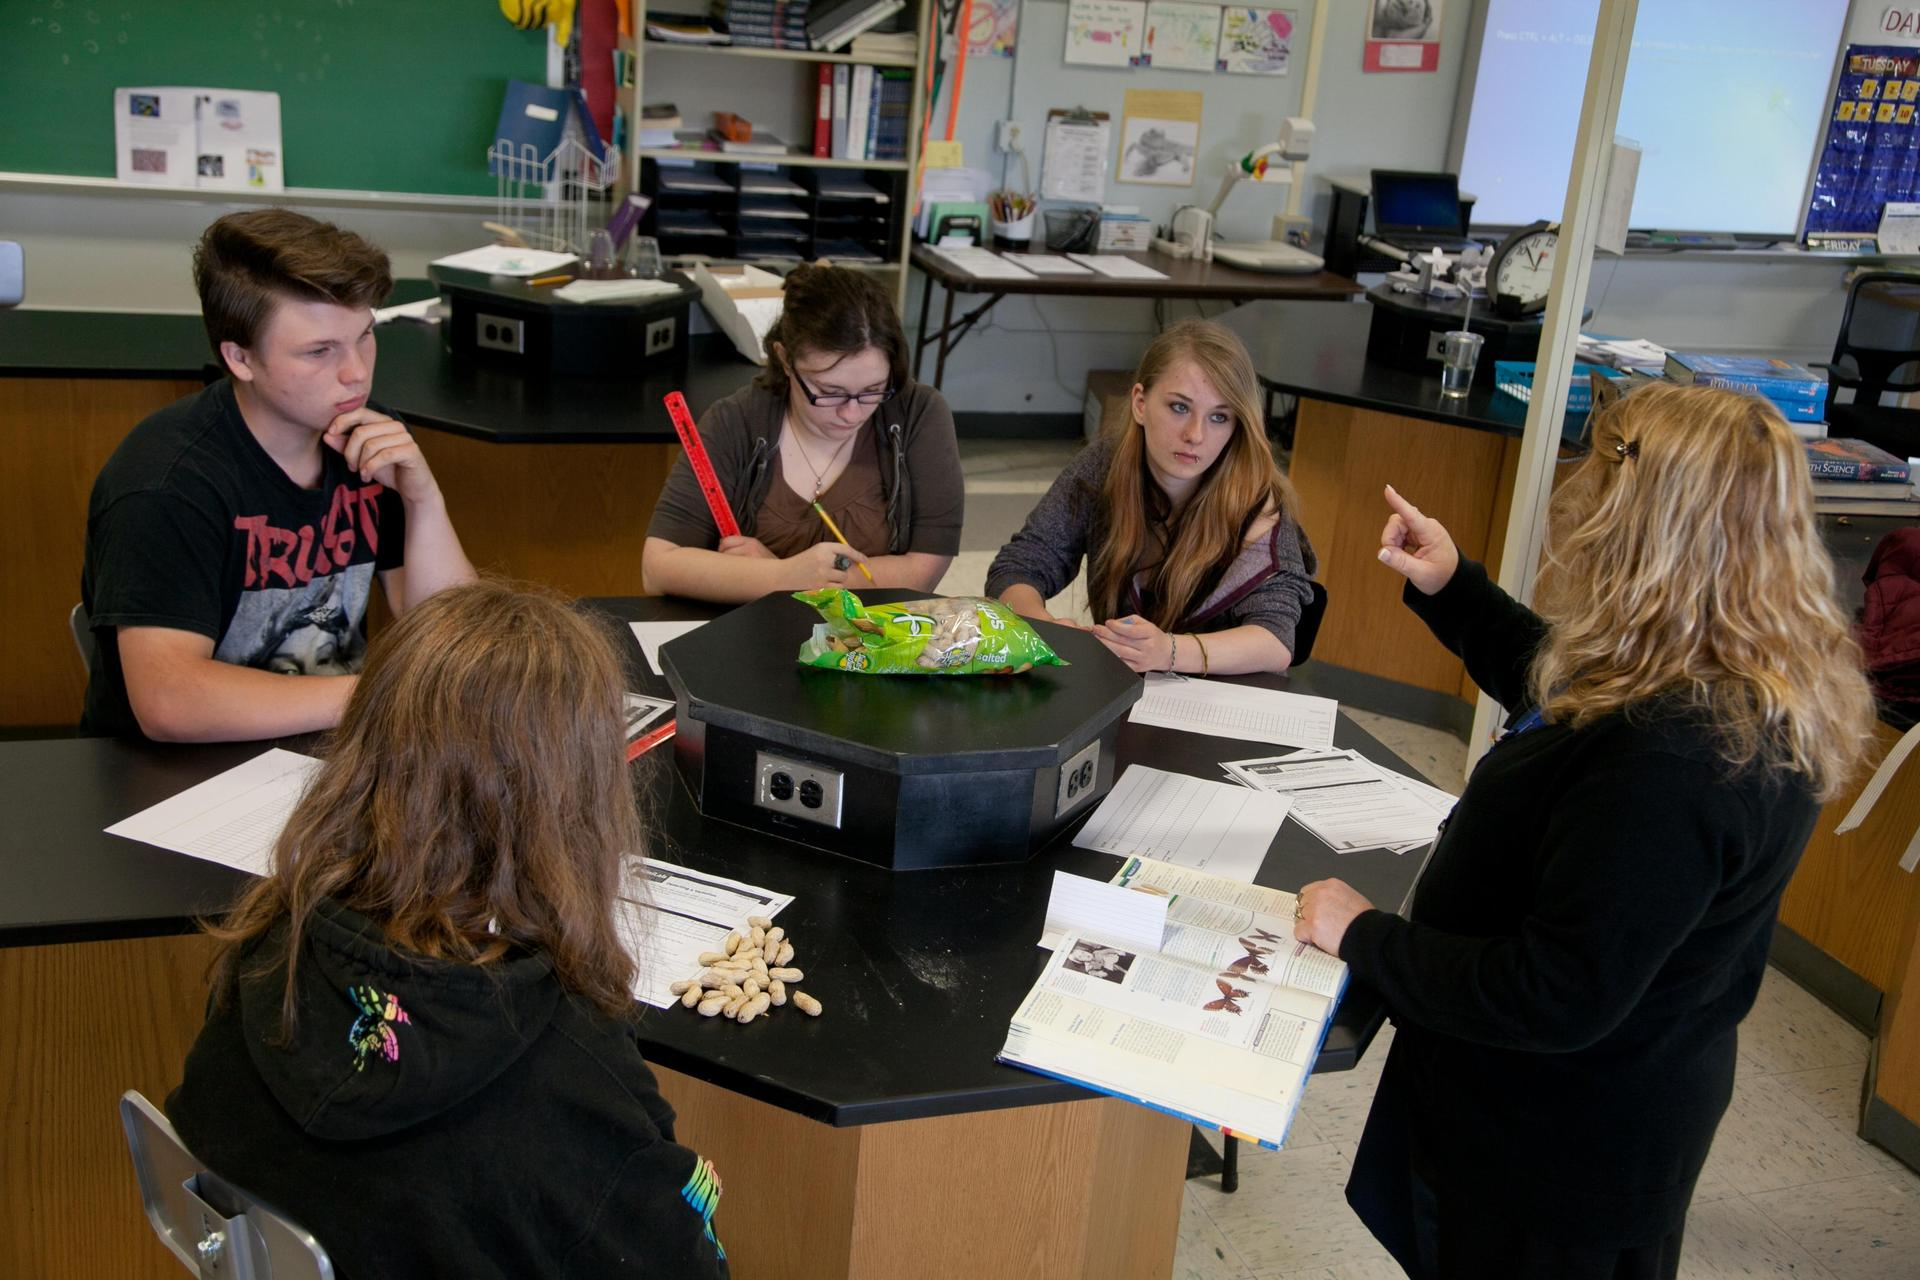 Teacher Providing Classroom Instruction